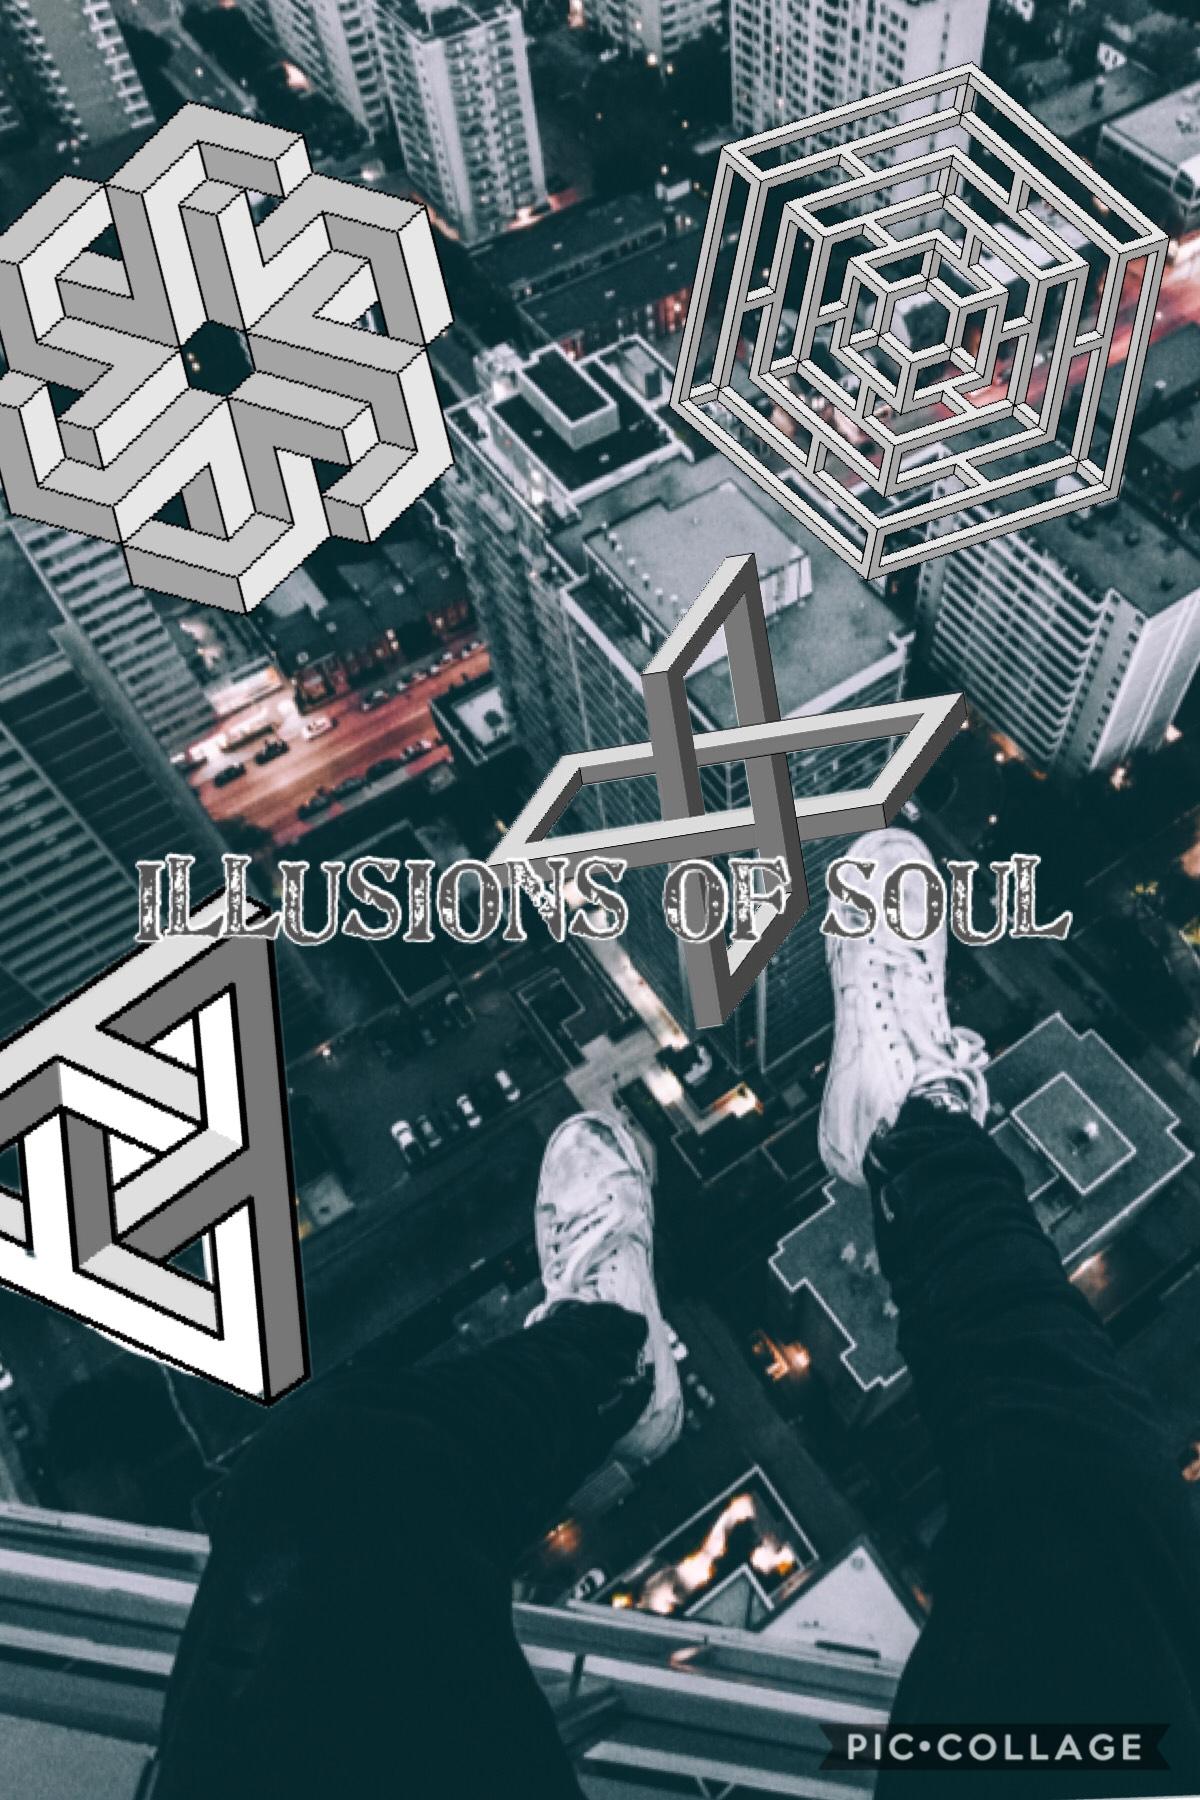 Who likes illusions